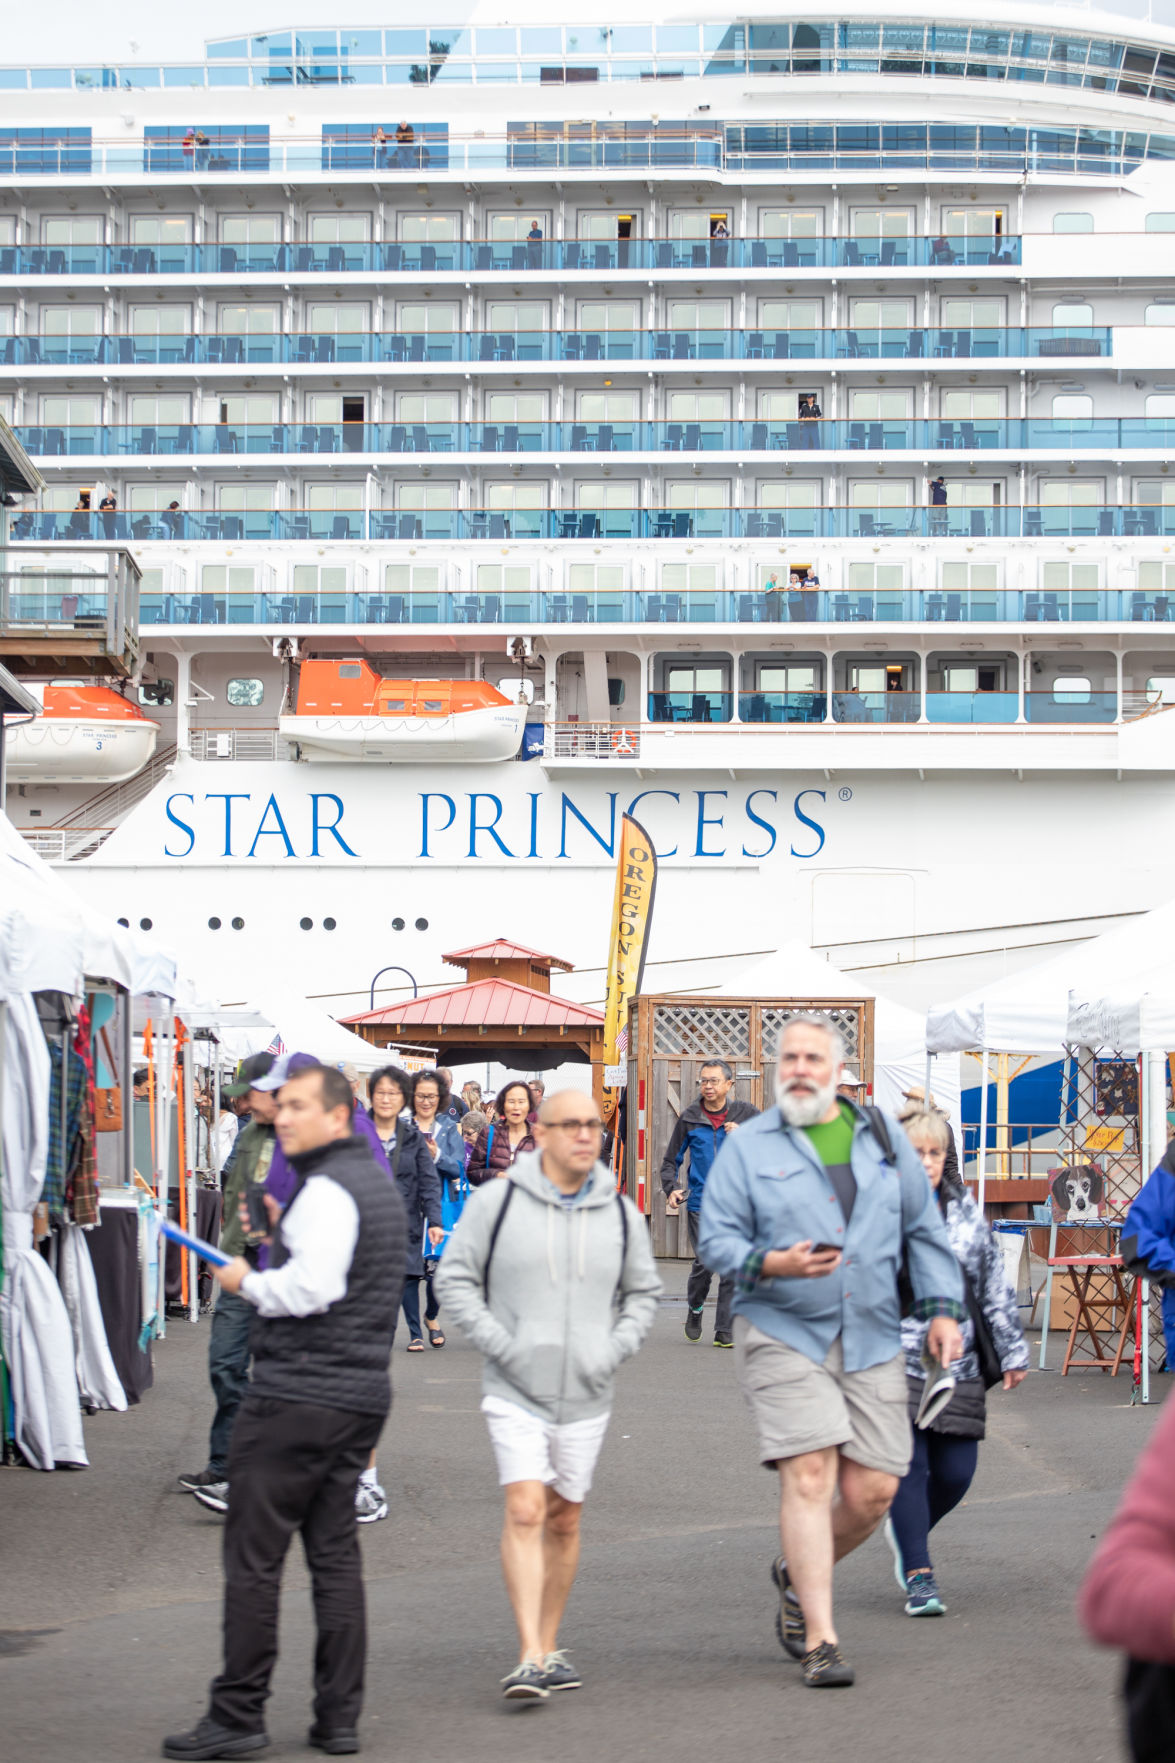 Star Princess tourists